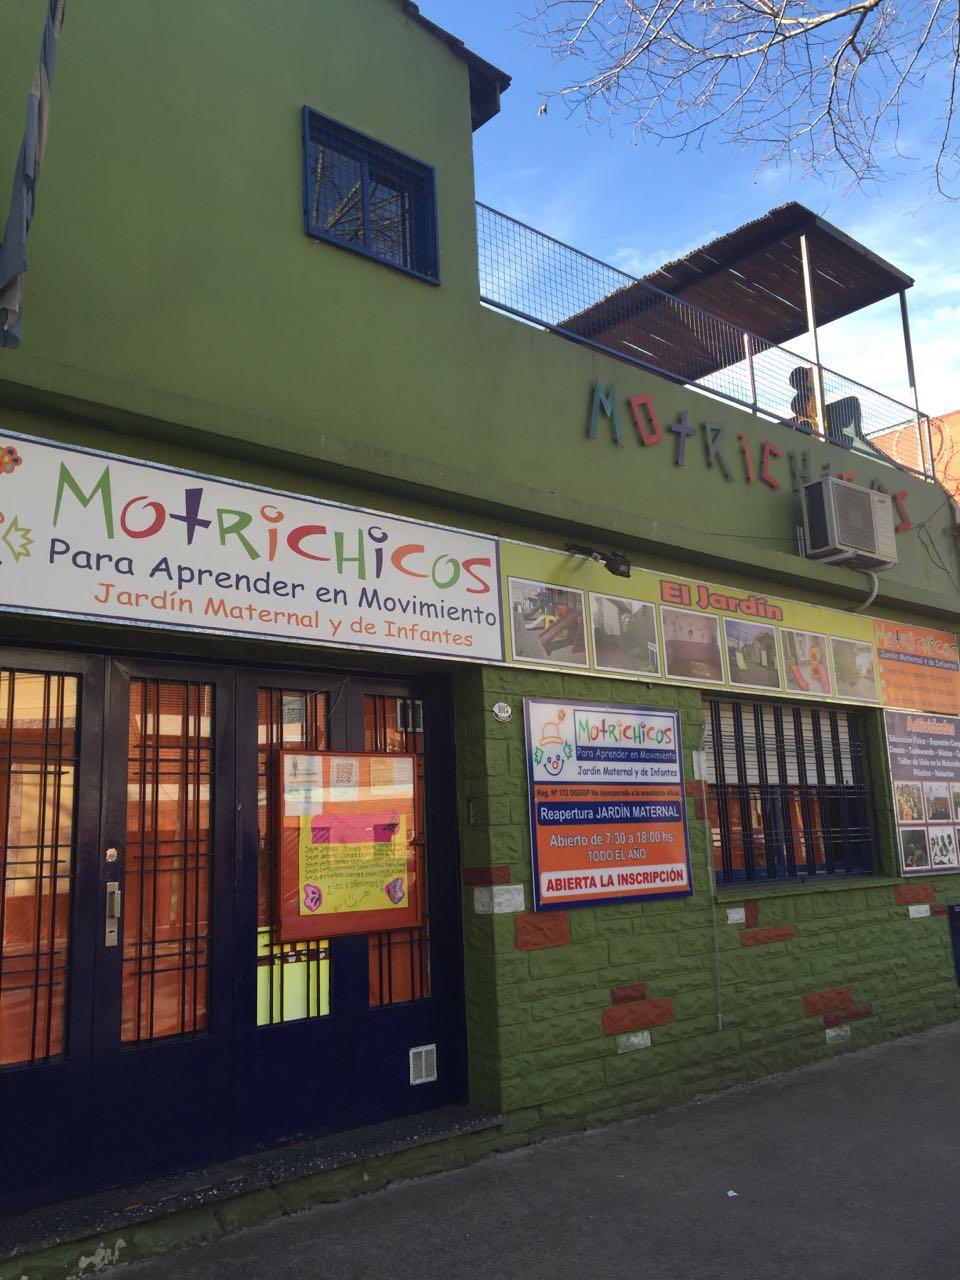 Jardín de infantes Motrichicos